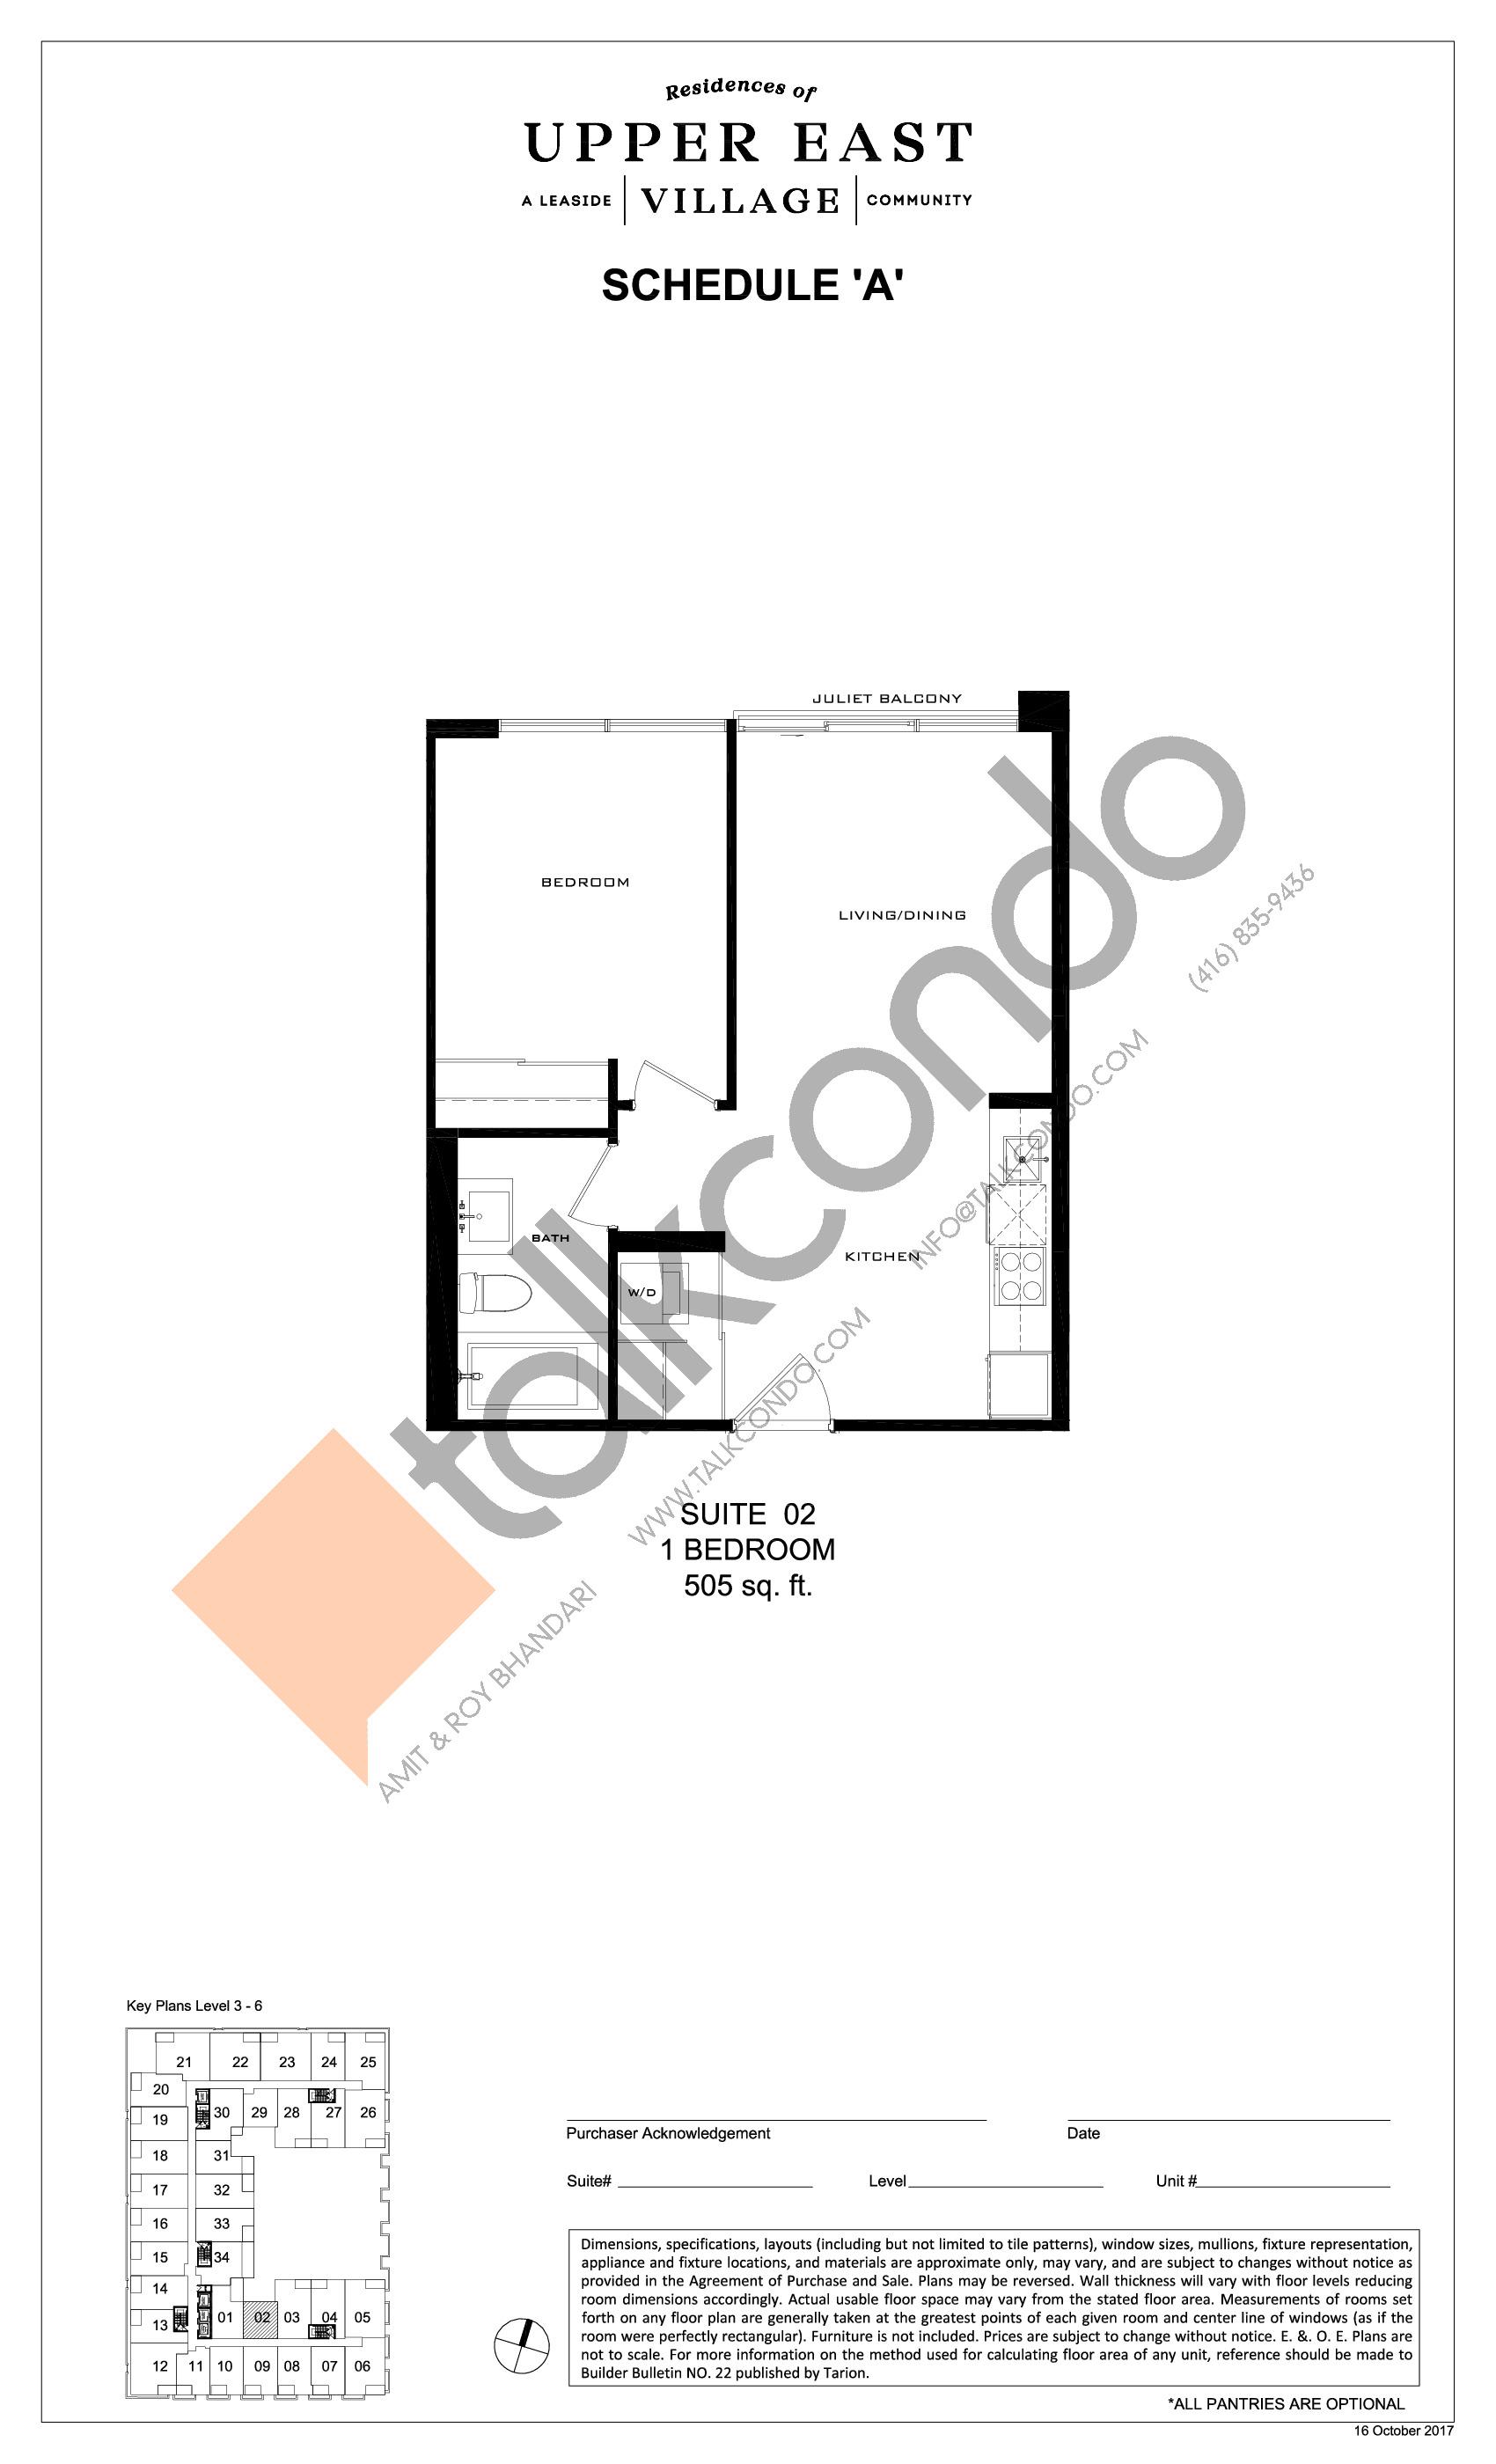 Suite 02 Floor Plan at Upper East Village Condos - 505 sq.ft